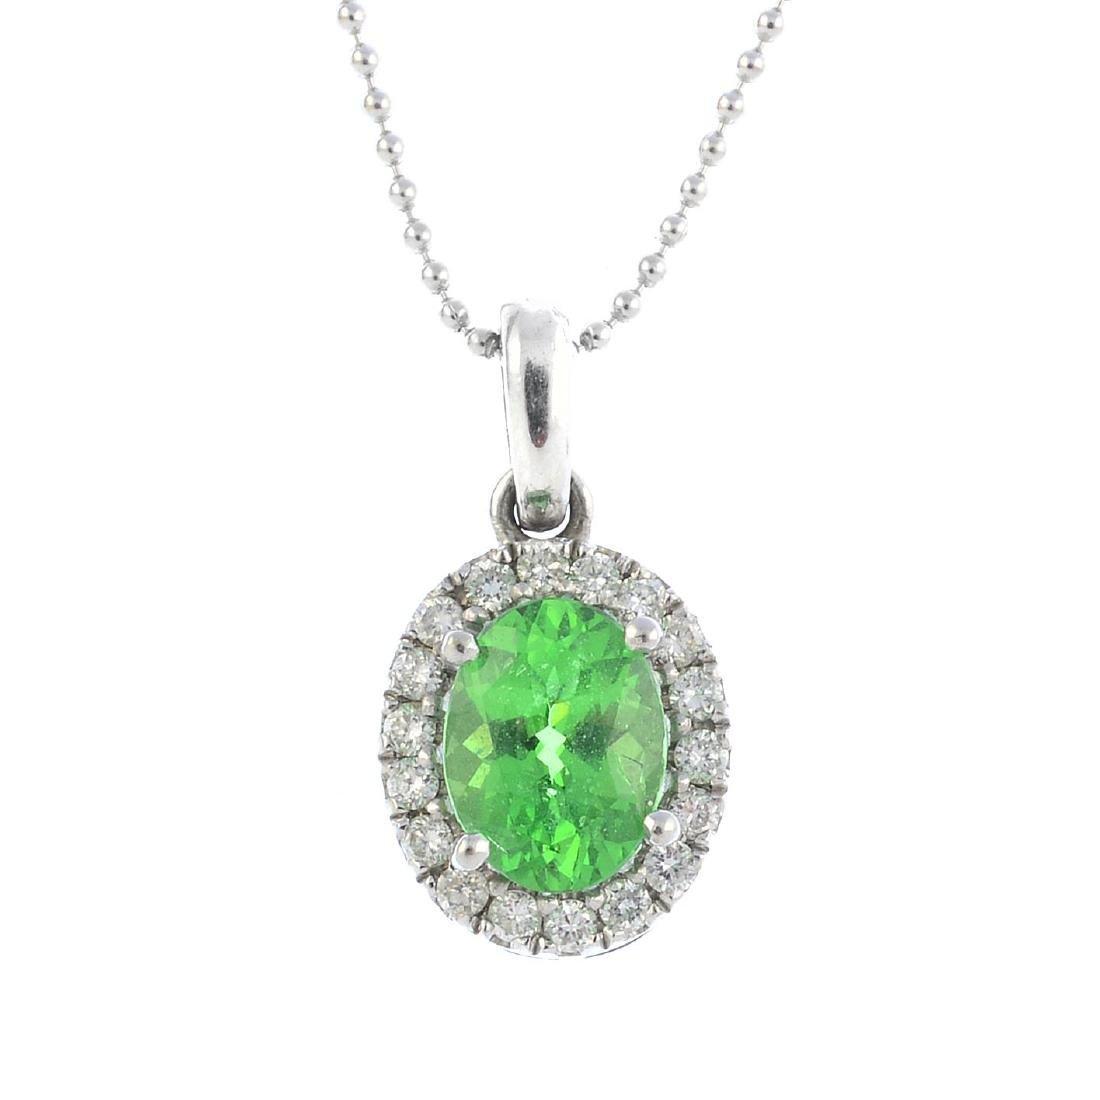 A tsavorite garnet and diamond cluster pendant. The